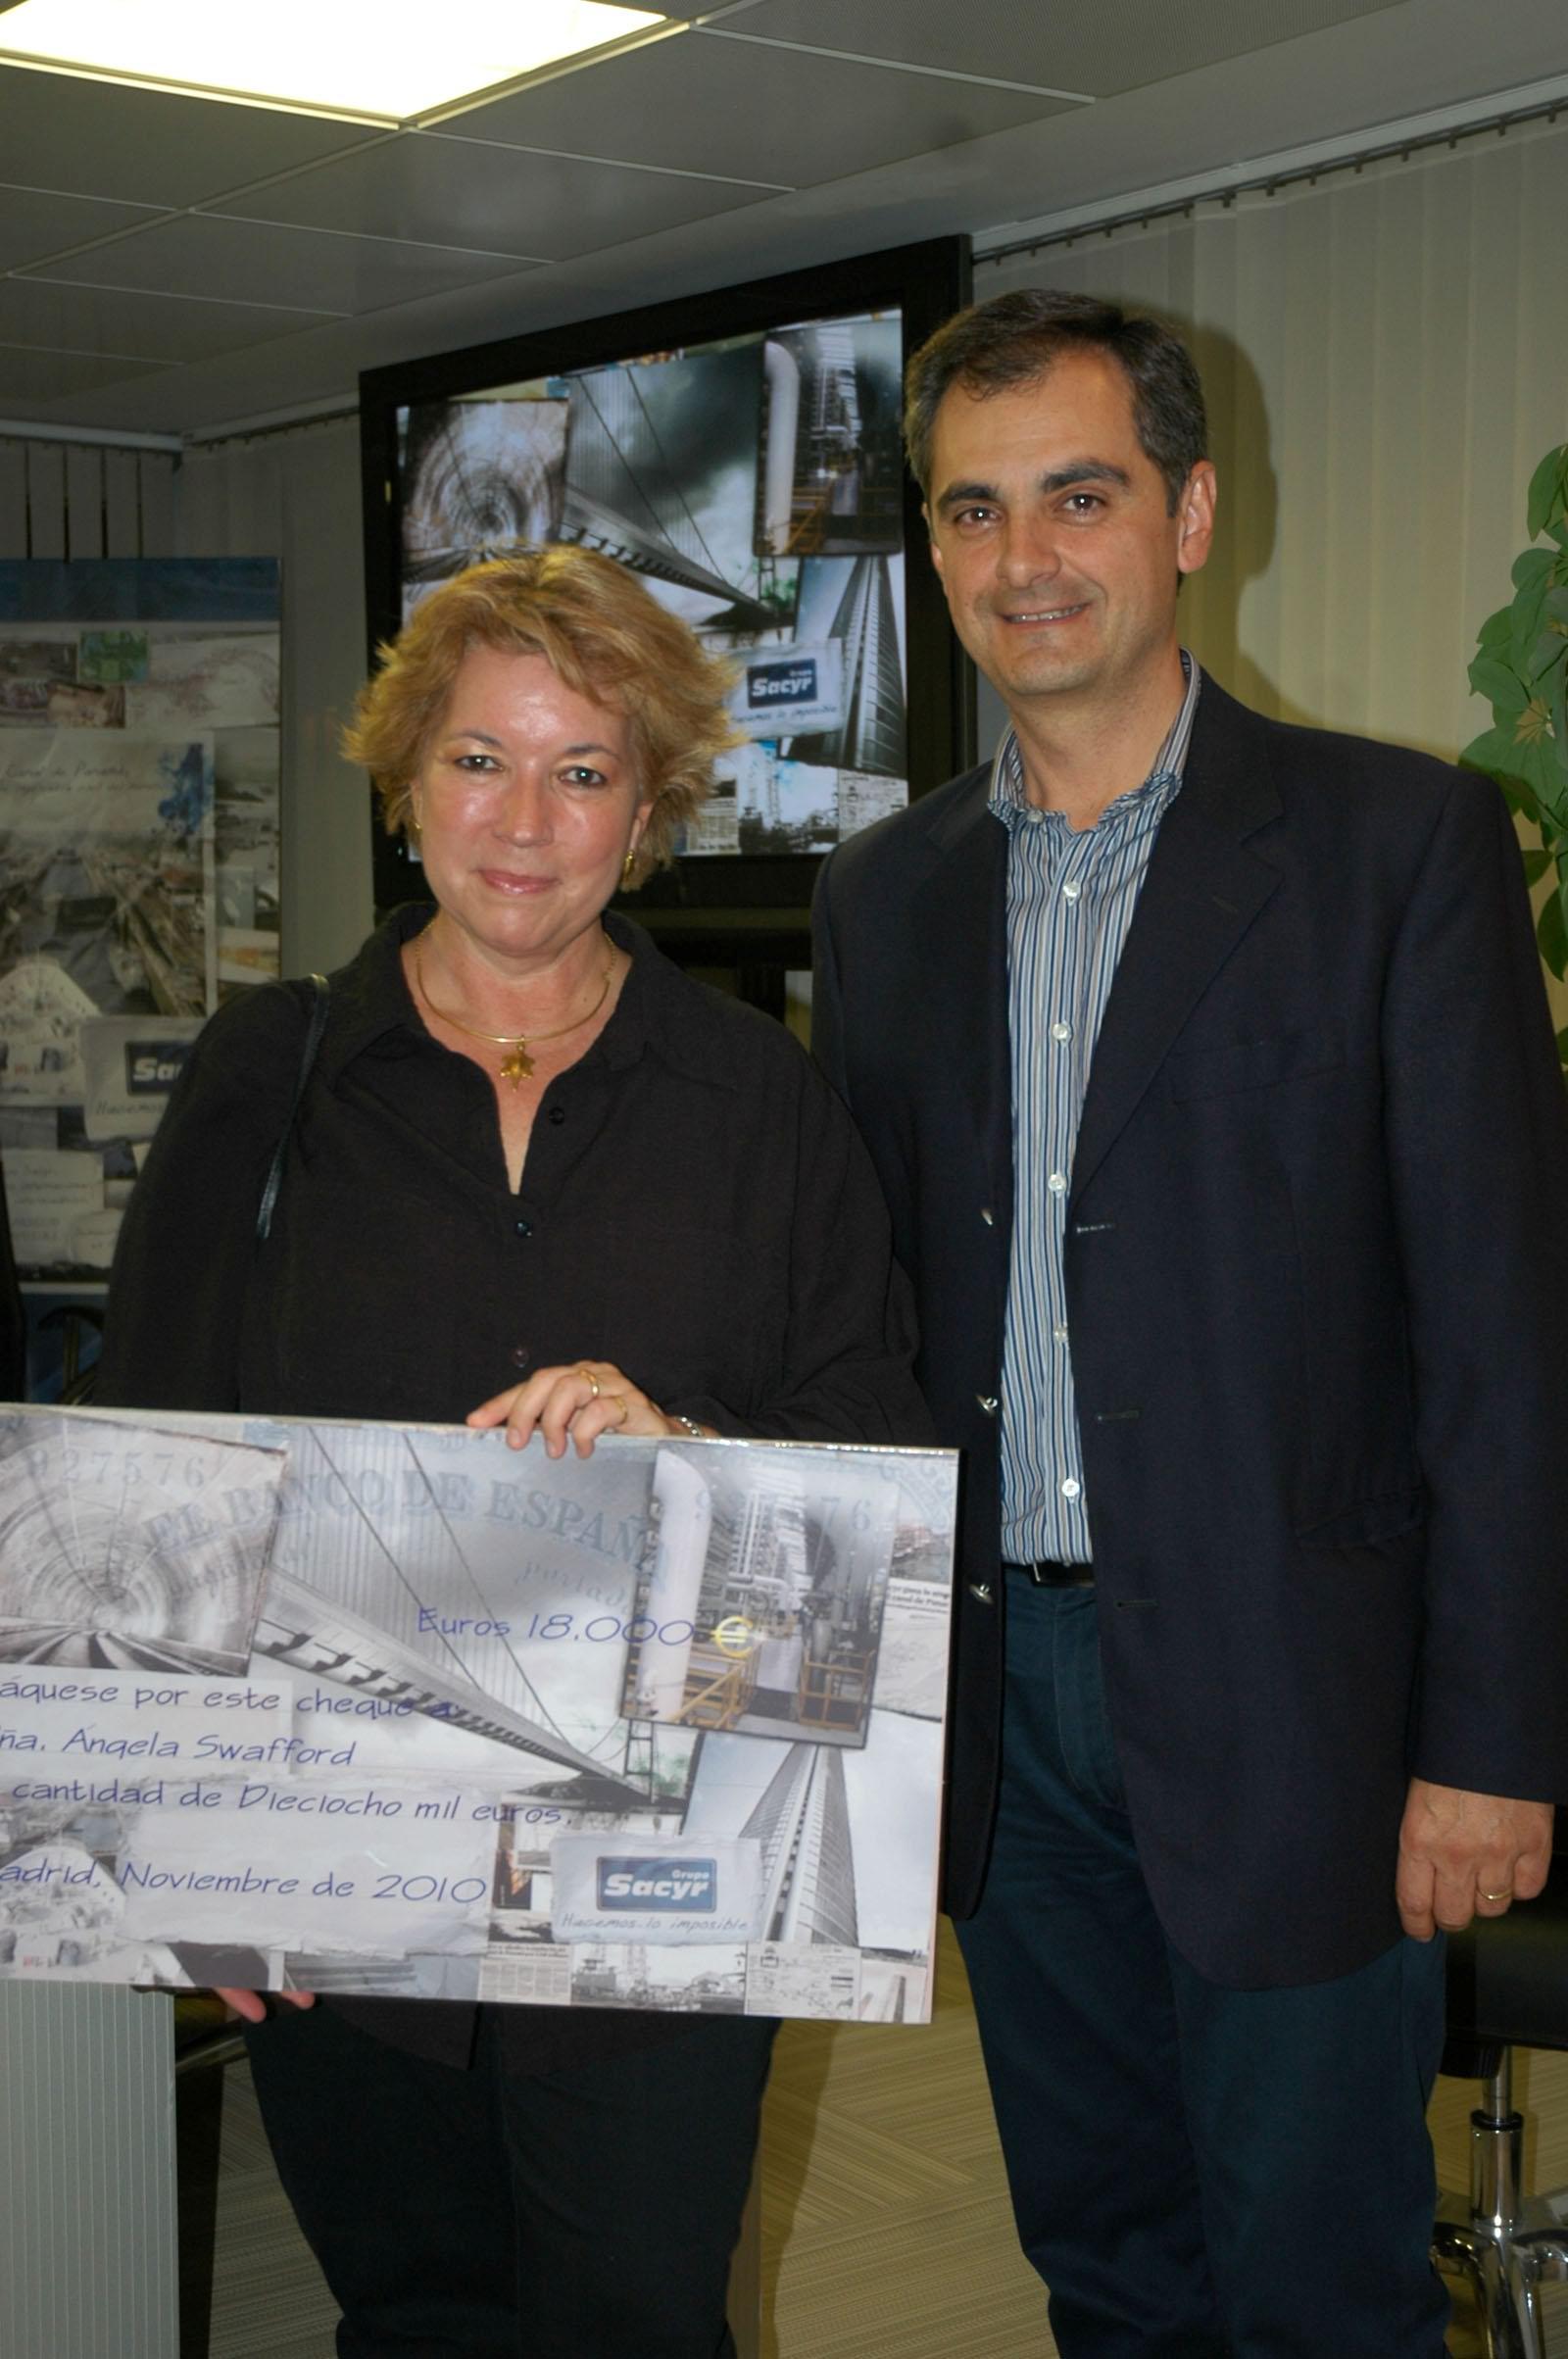 Premio Sacyr